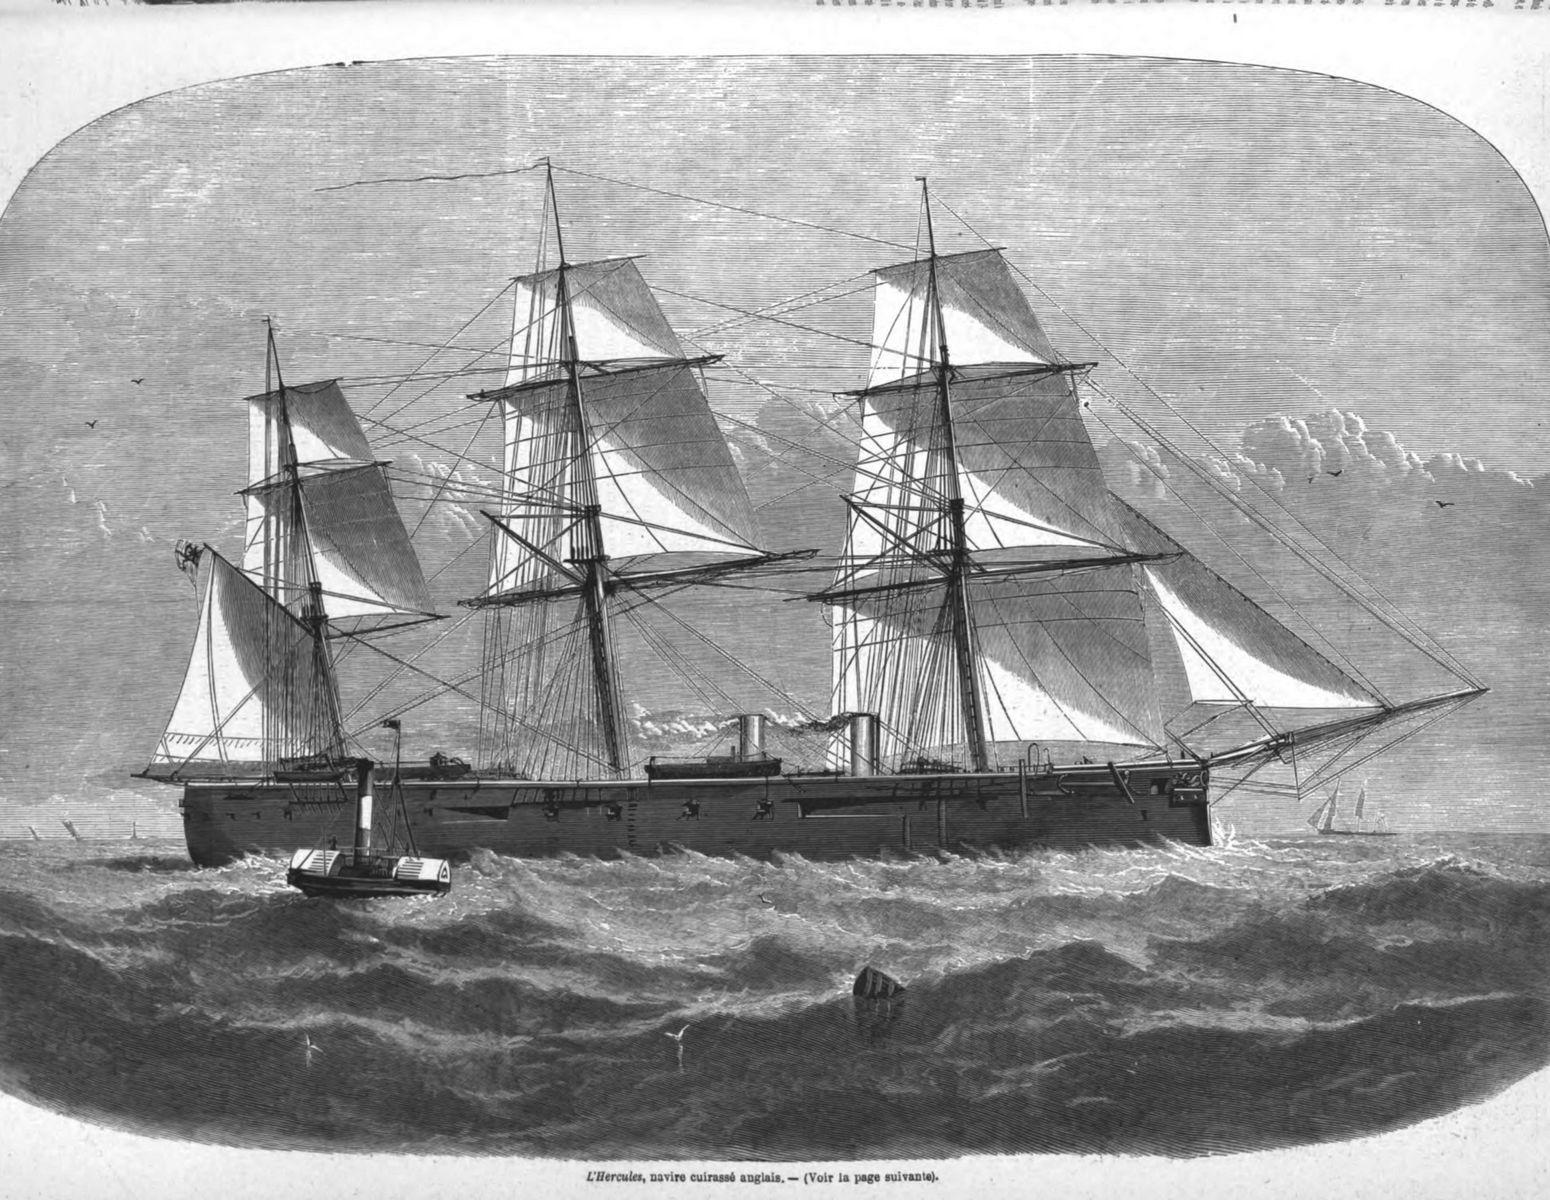 L'Hercules,navire cuirassé anglais.